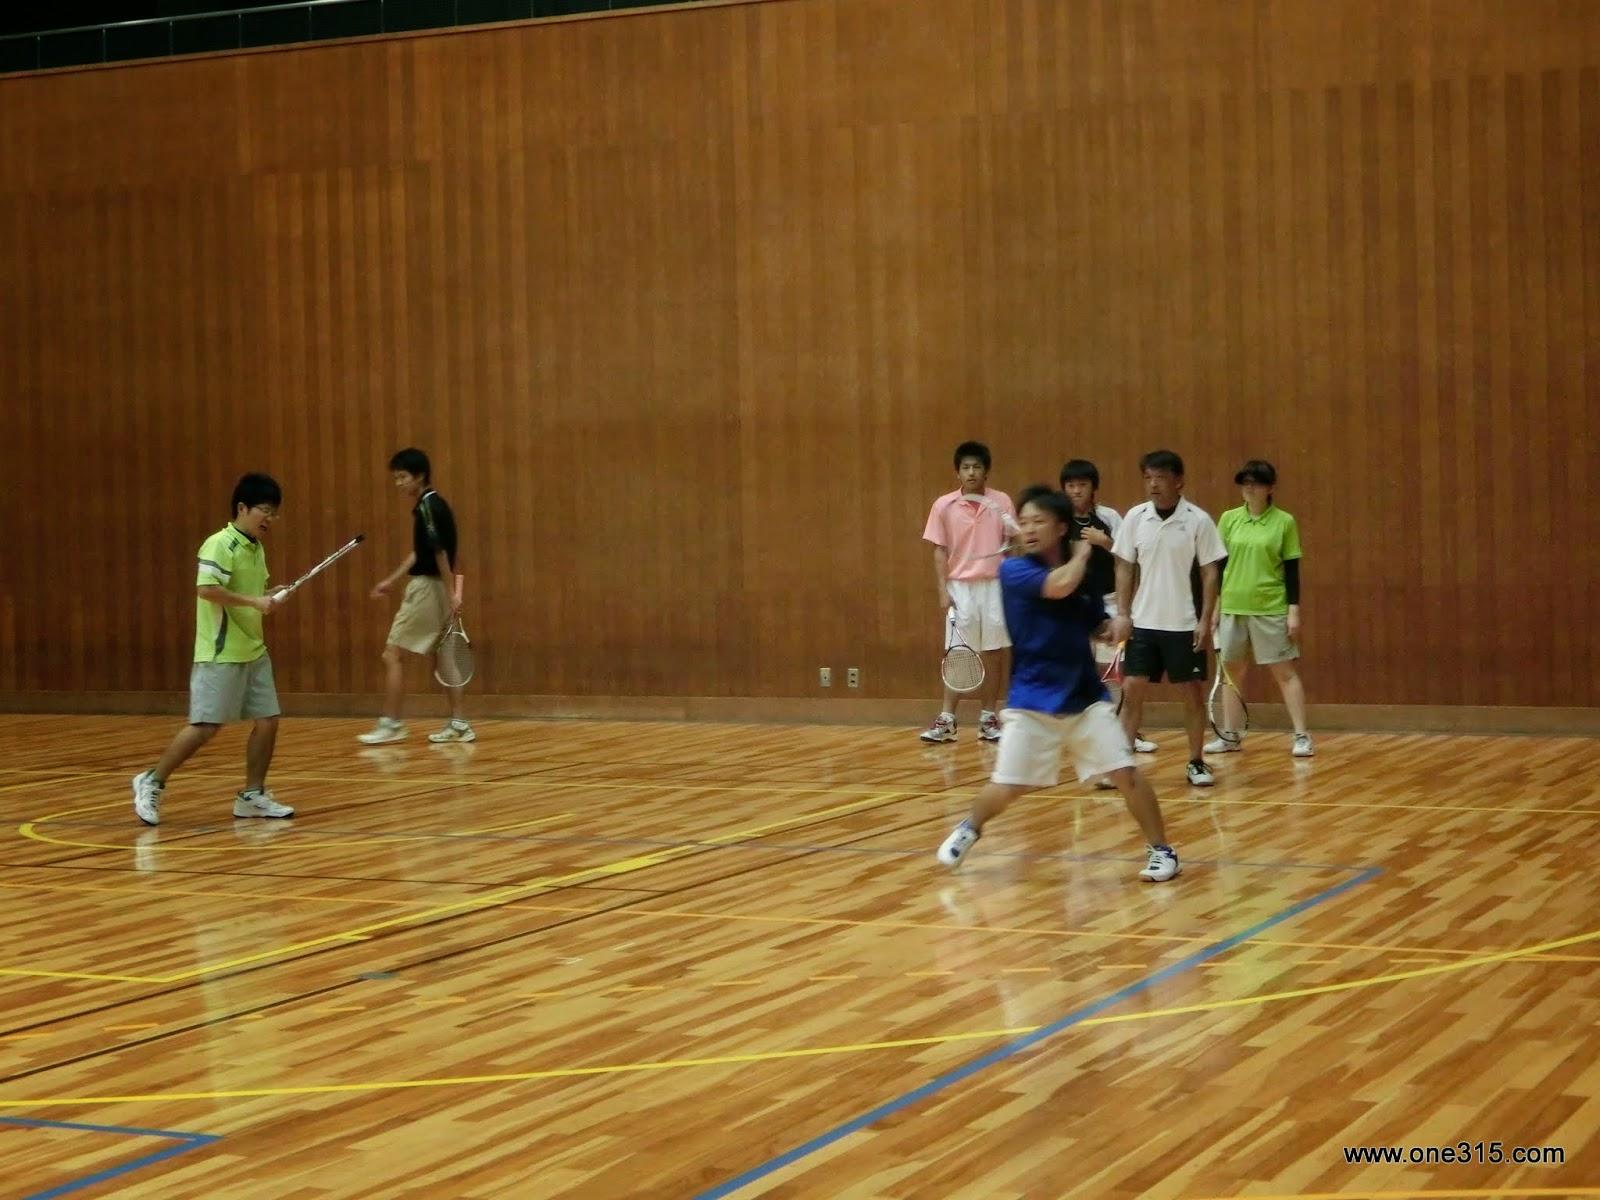 2013.06.11 one315ソフトテニス...